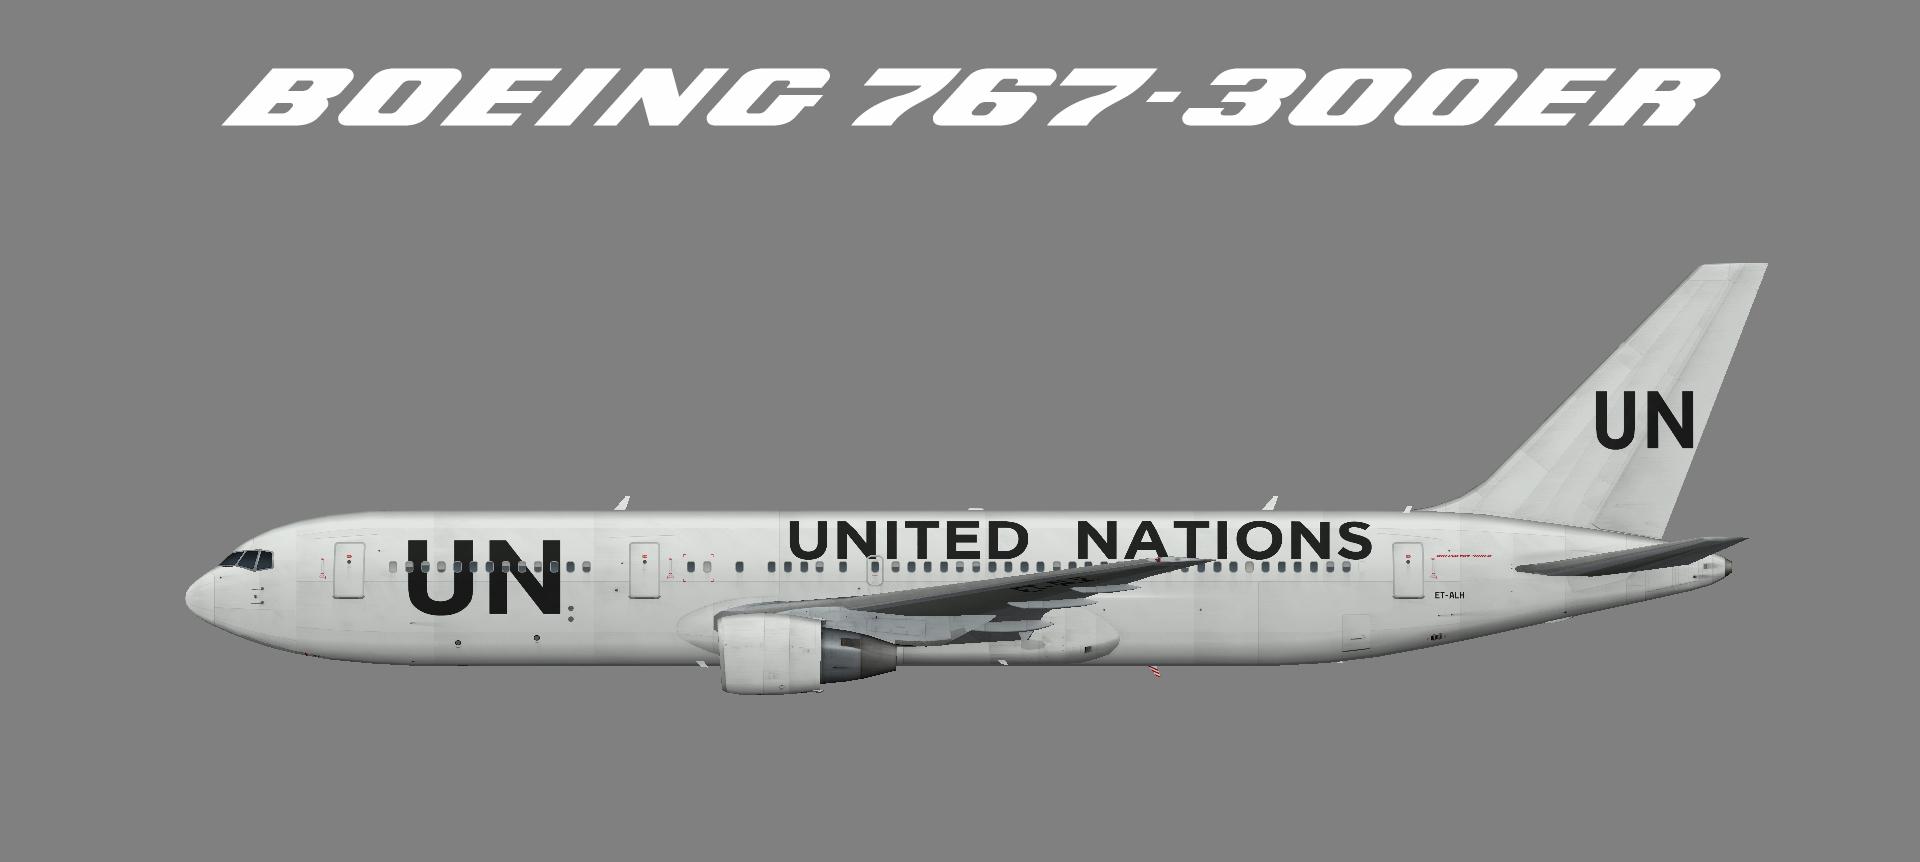 Ethiopian Airlinas Boeing 767-300 (opf UN)